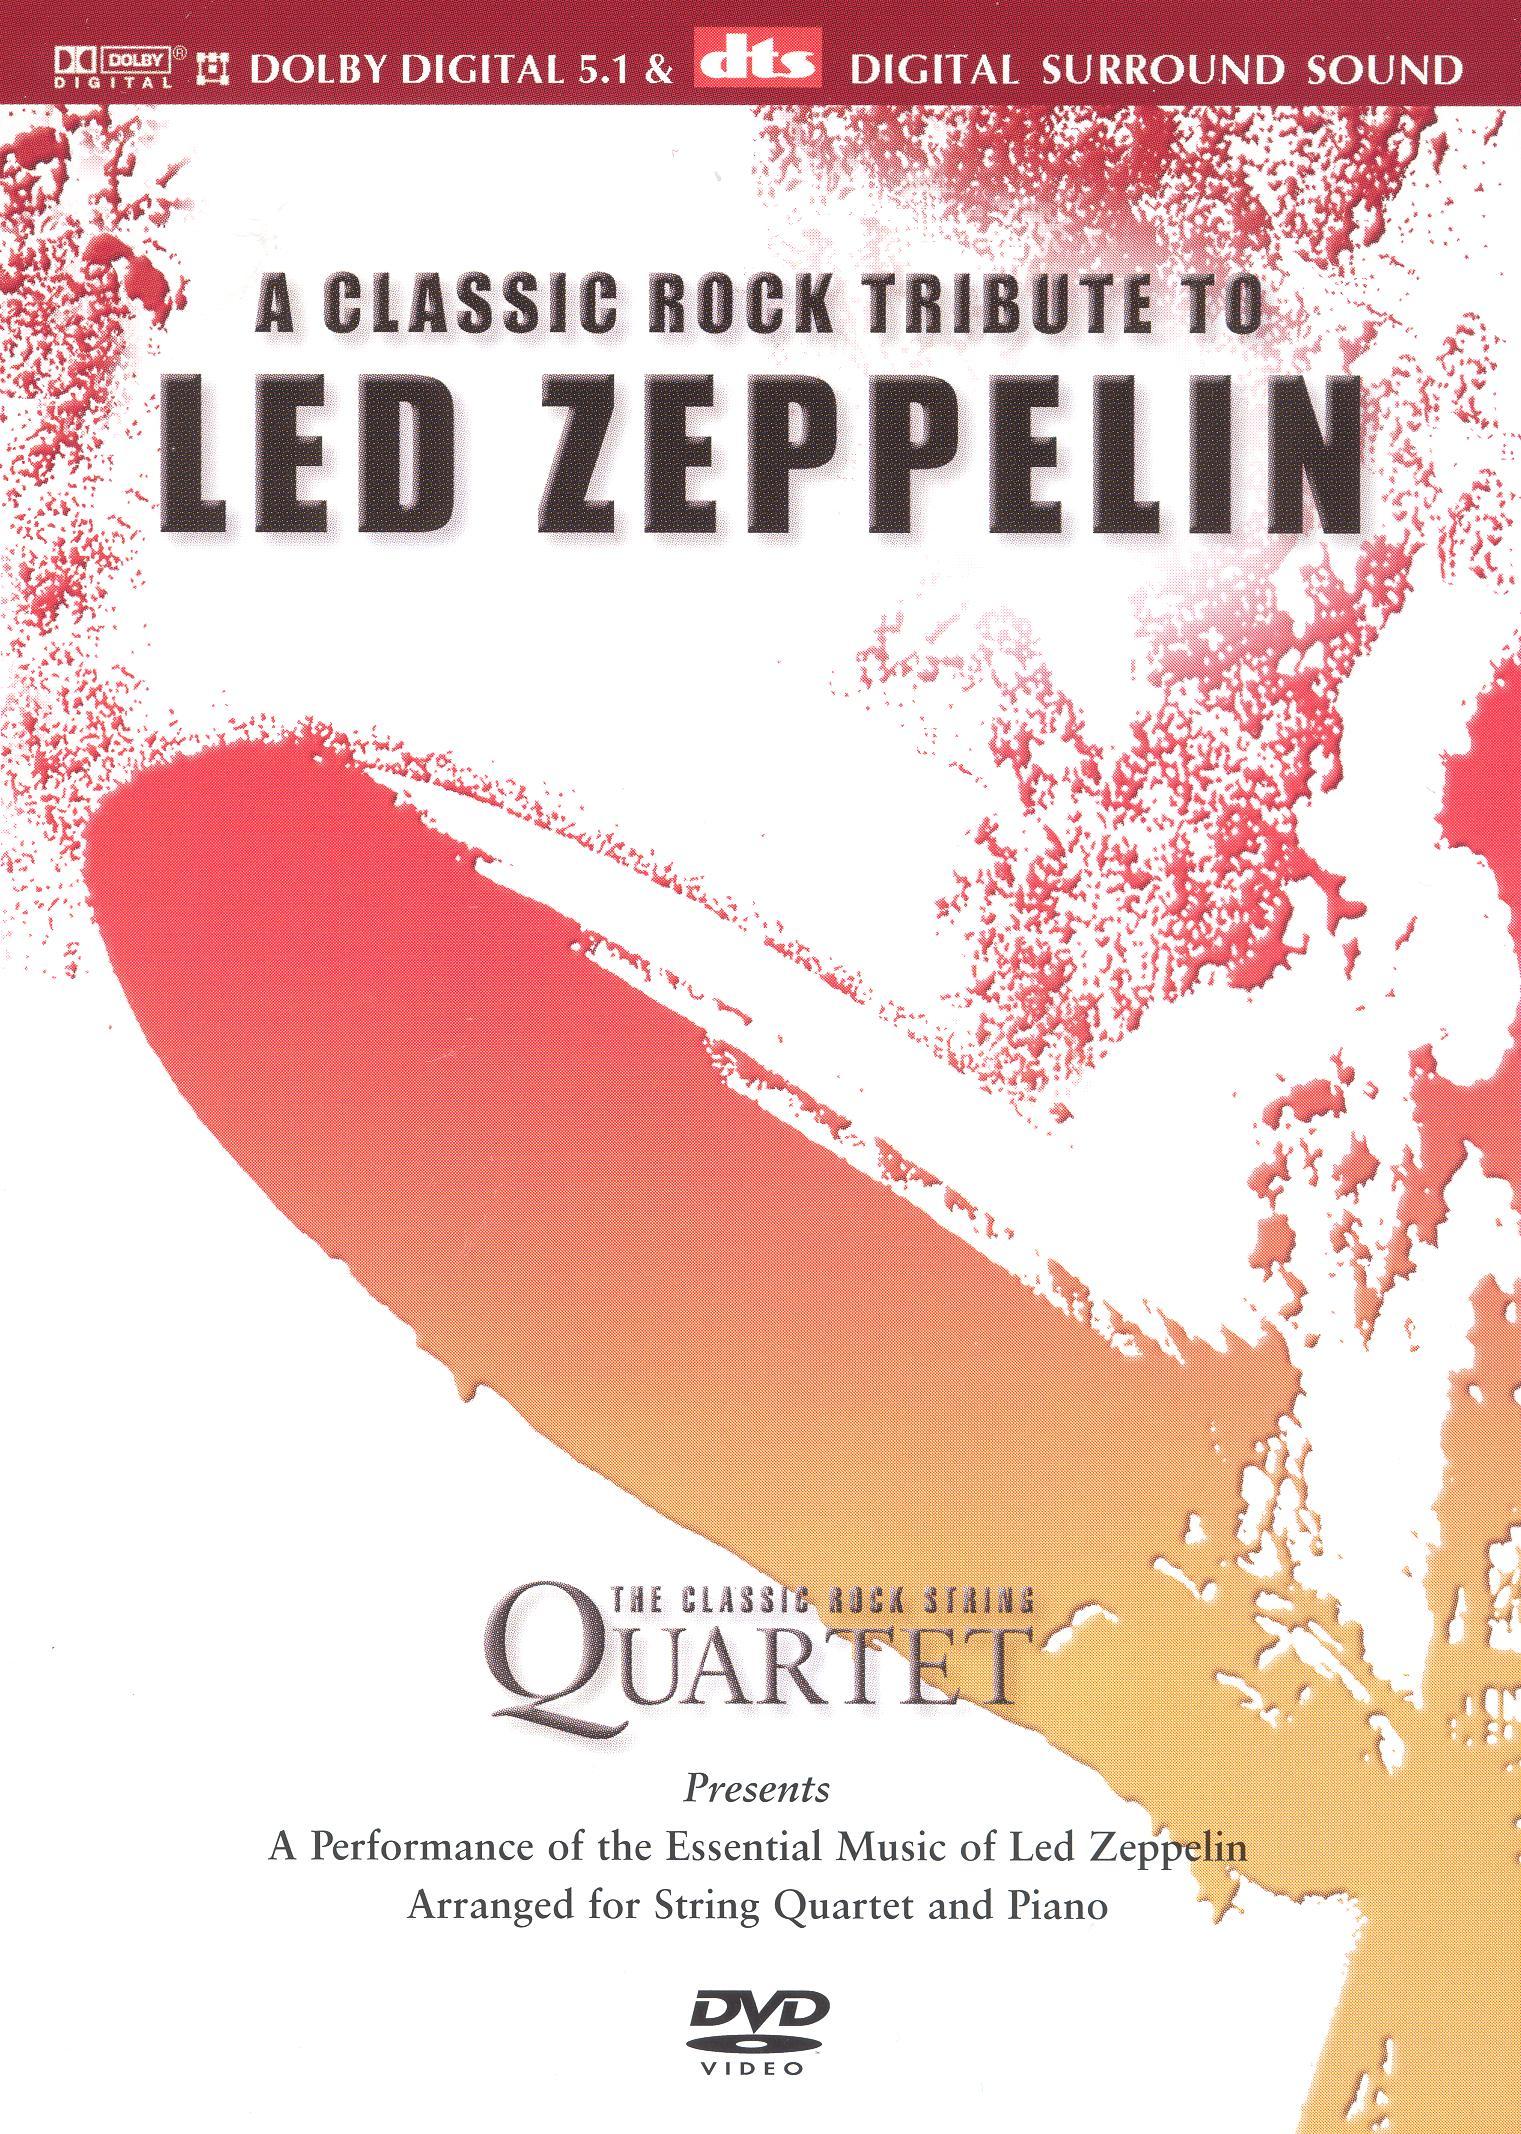 Classic Rock Quartet: Tribute to Led Zeppelin